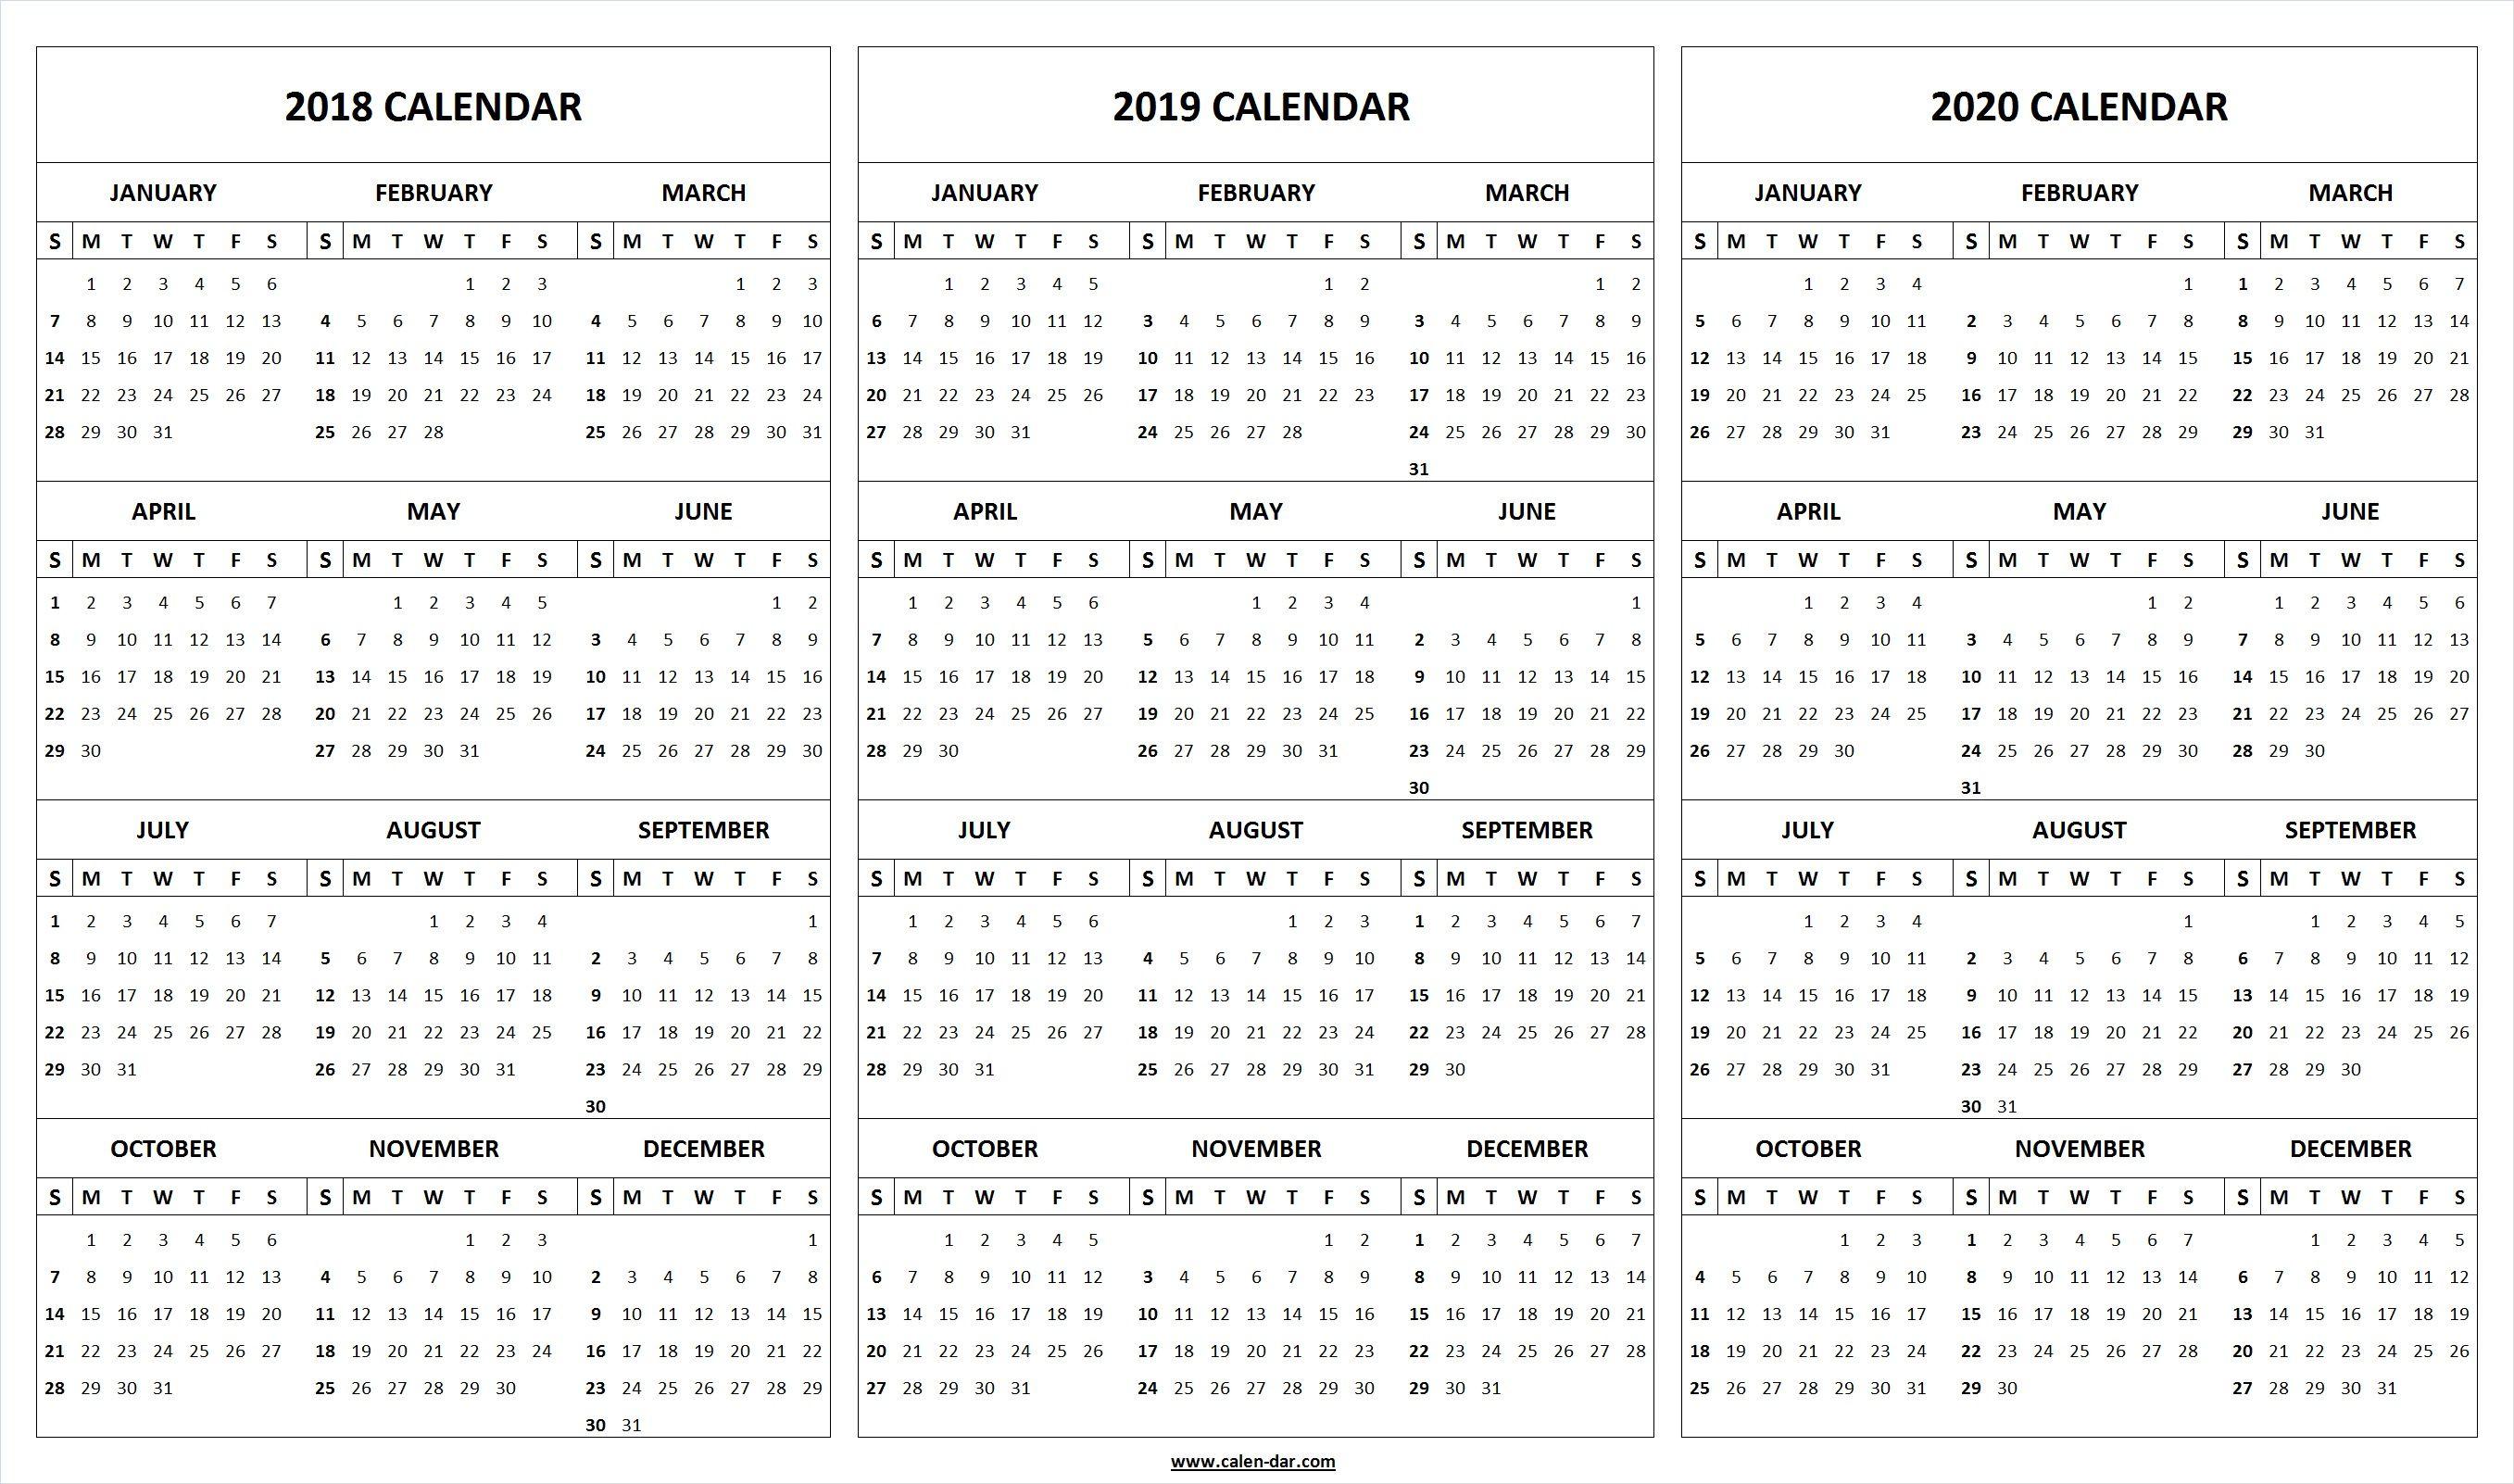 Print Blank 2018 2019 2020 Calendar Template   Organize!   2019 regarding Printable Year At Glance Calendar For 2020